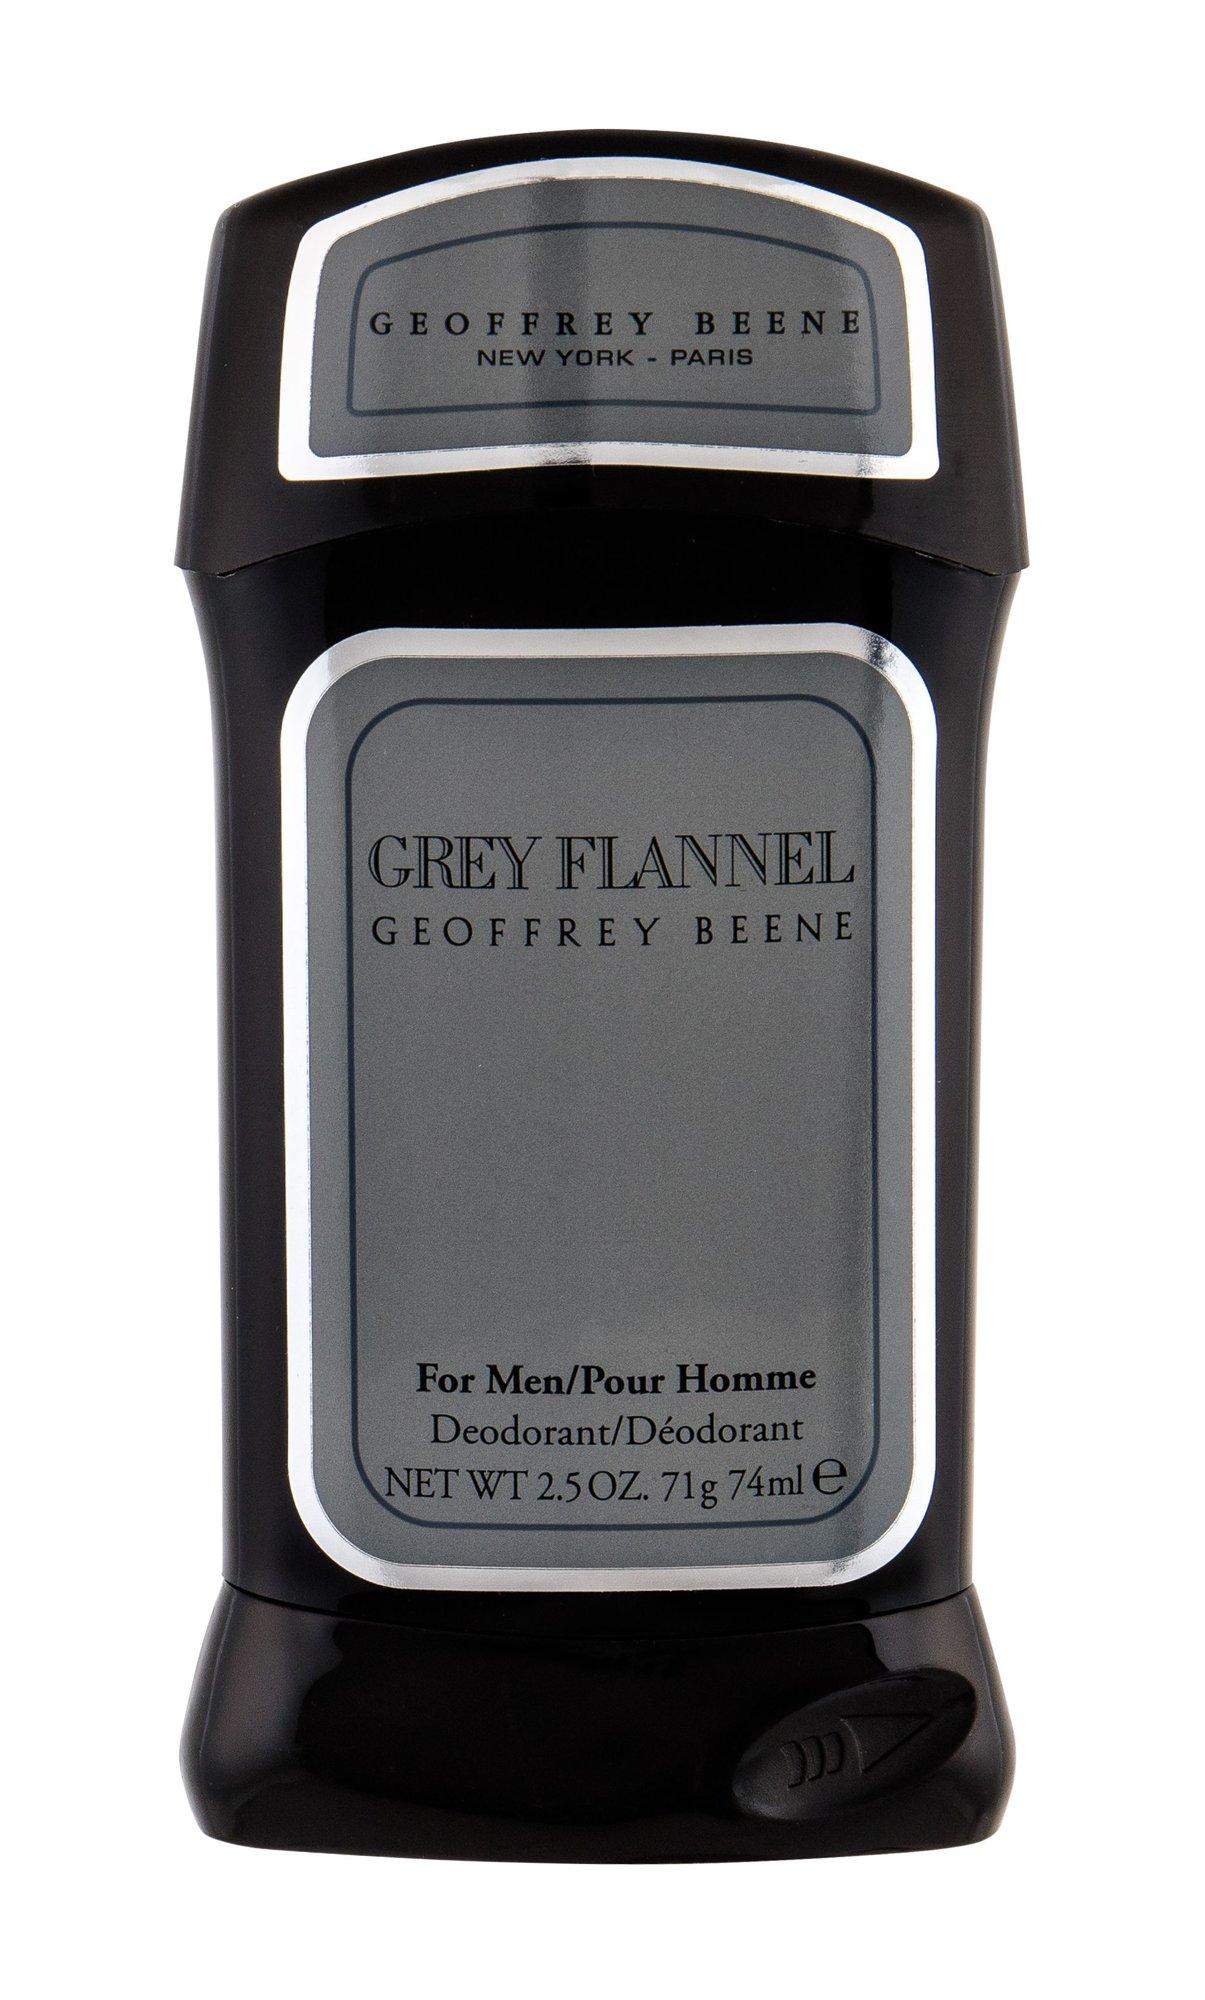 Geoffrey Beene Grey Flannel Deodorant 74ml